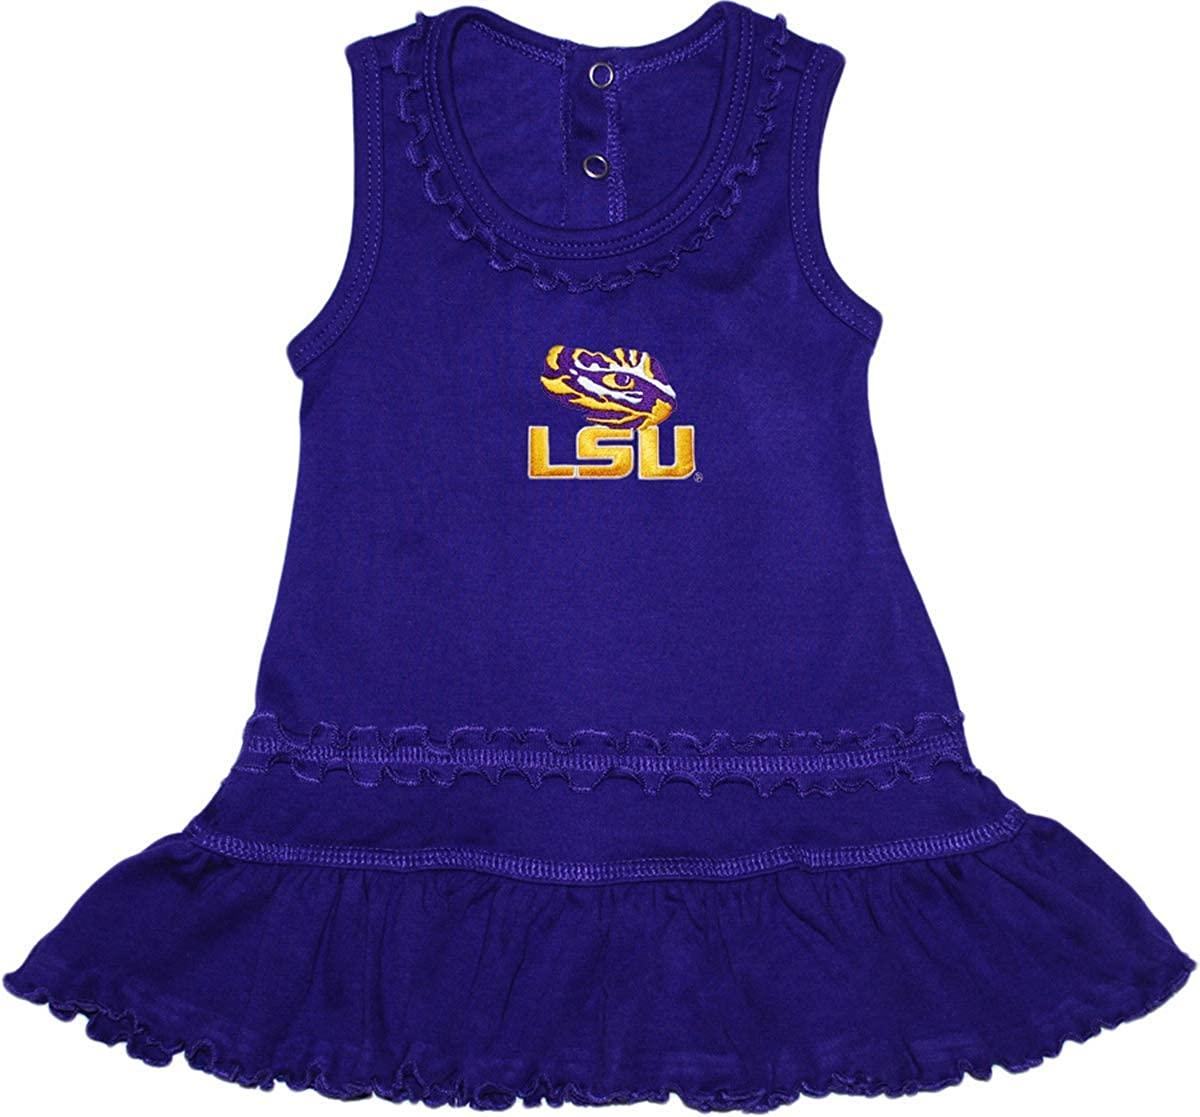 Louisiana State University LSU Tiger Eye Ruffled Tank Top Dress with Bloomer Set